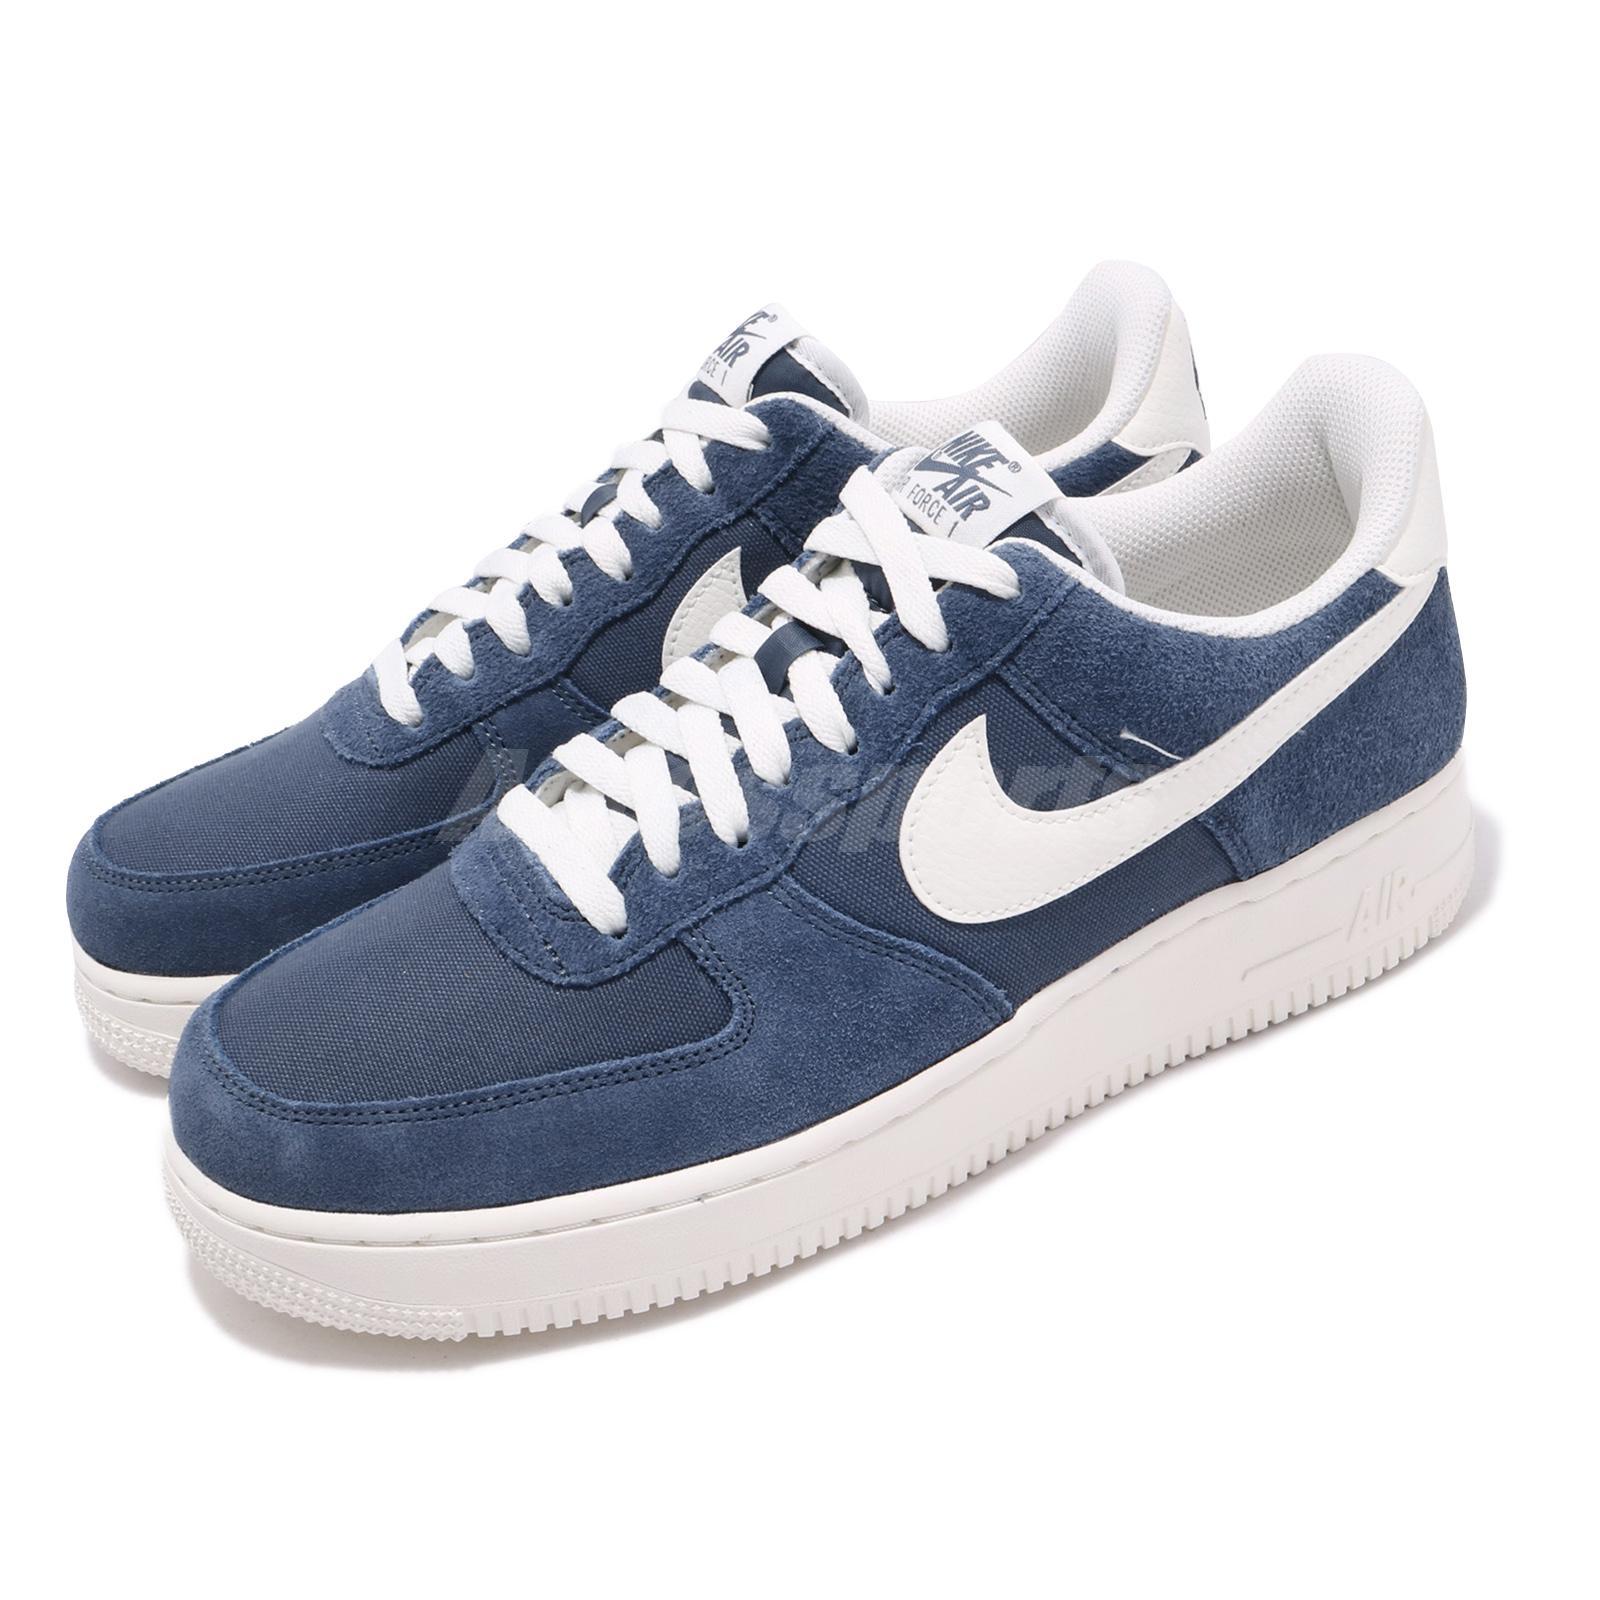 AIR FORCE 1 '07 Sneaker low monsoon bluesail